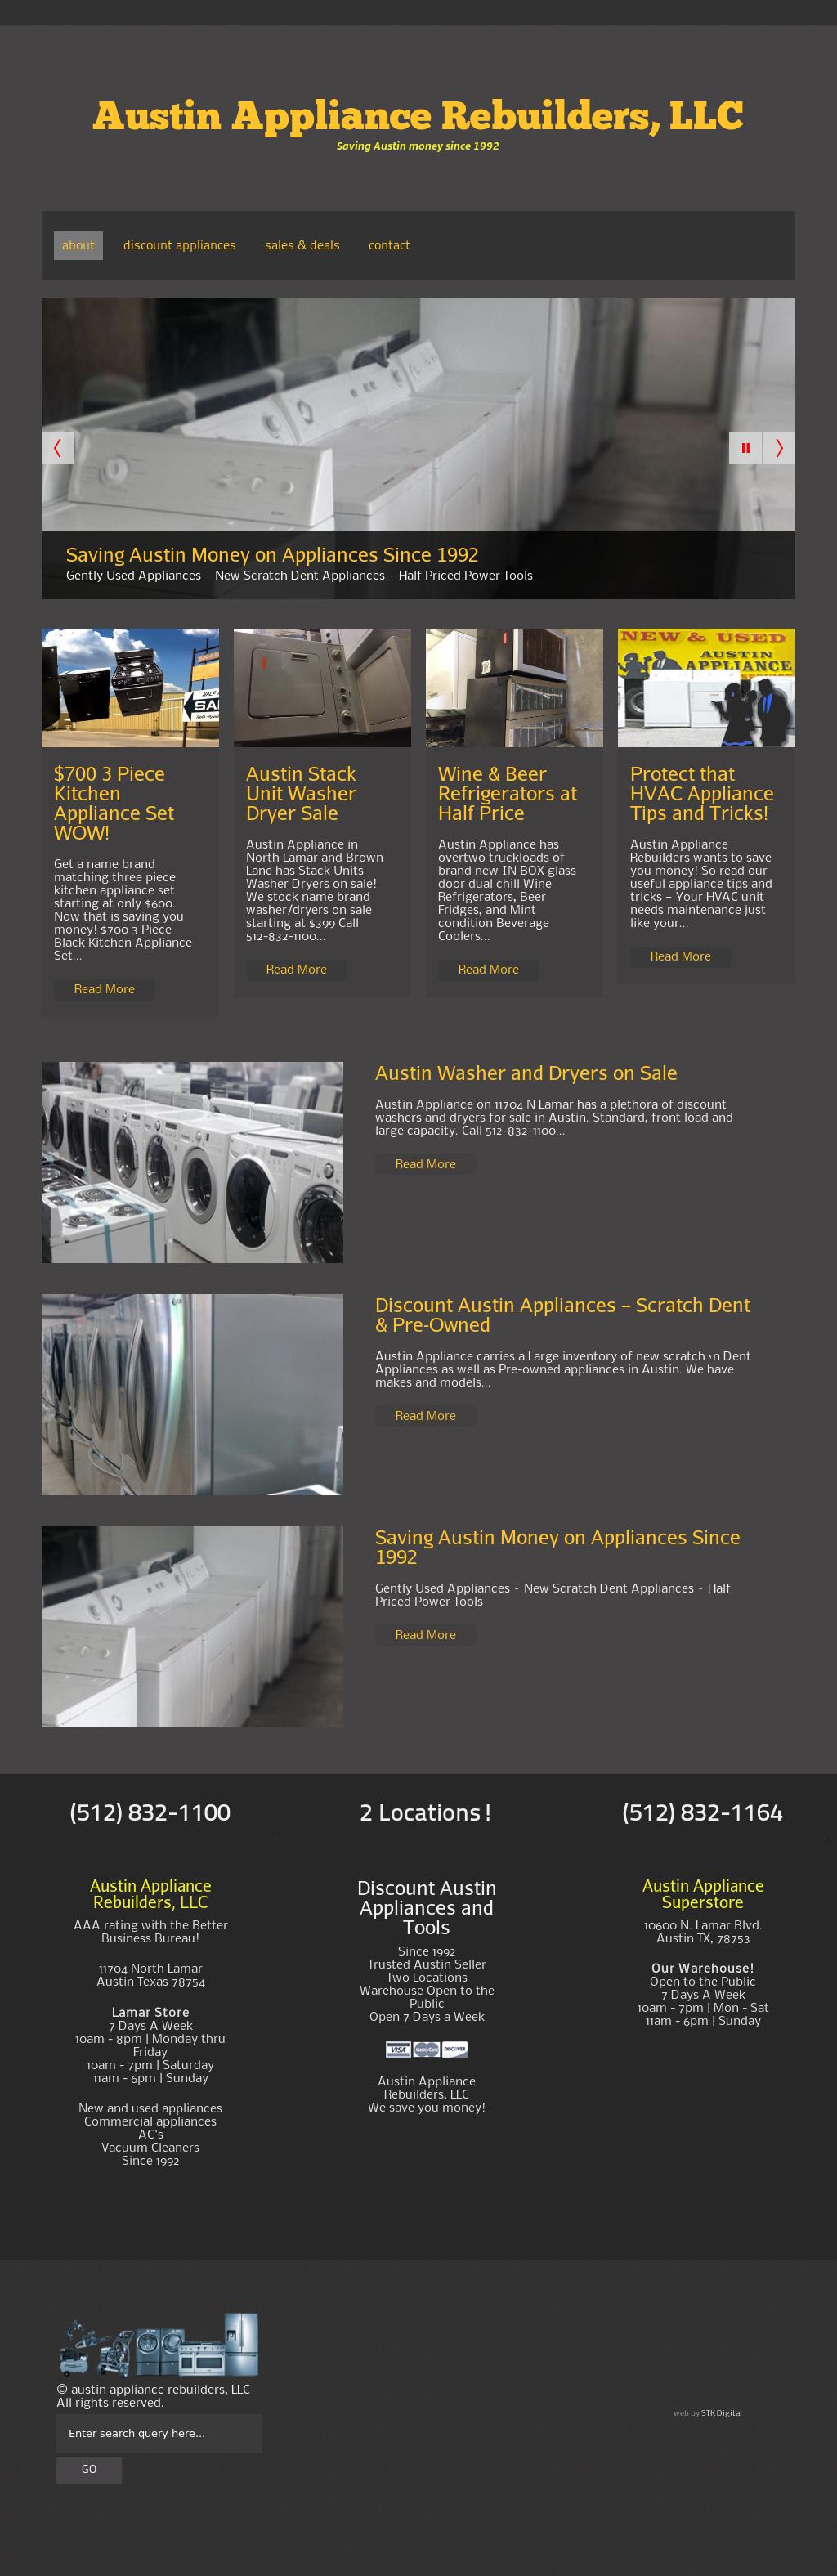 Austin Appliance Rebuilders Competitors, Revenue and